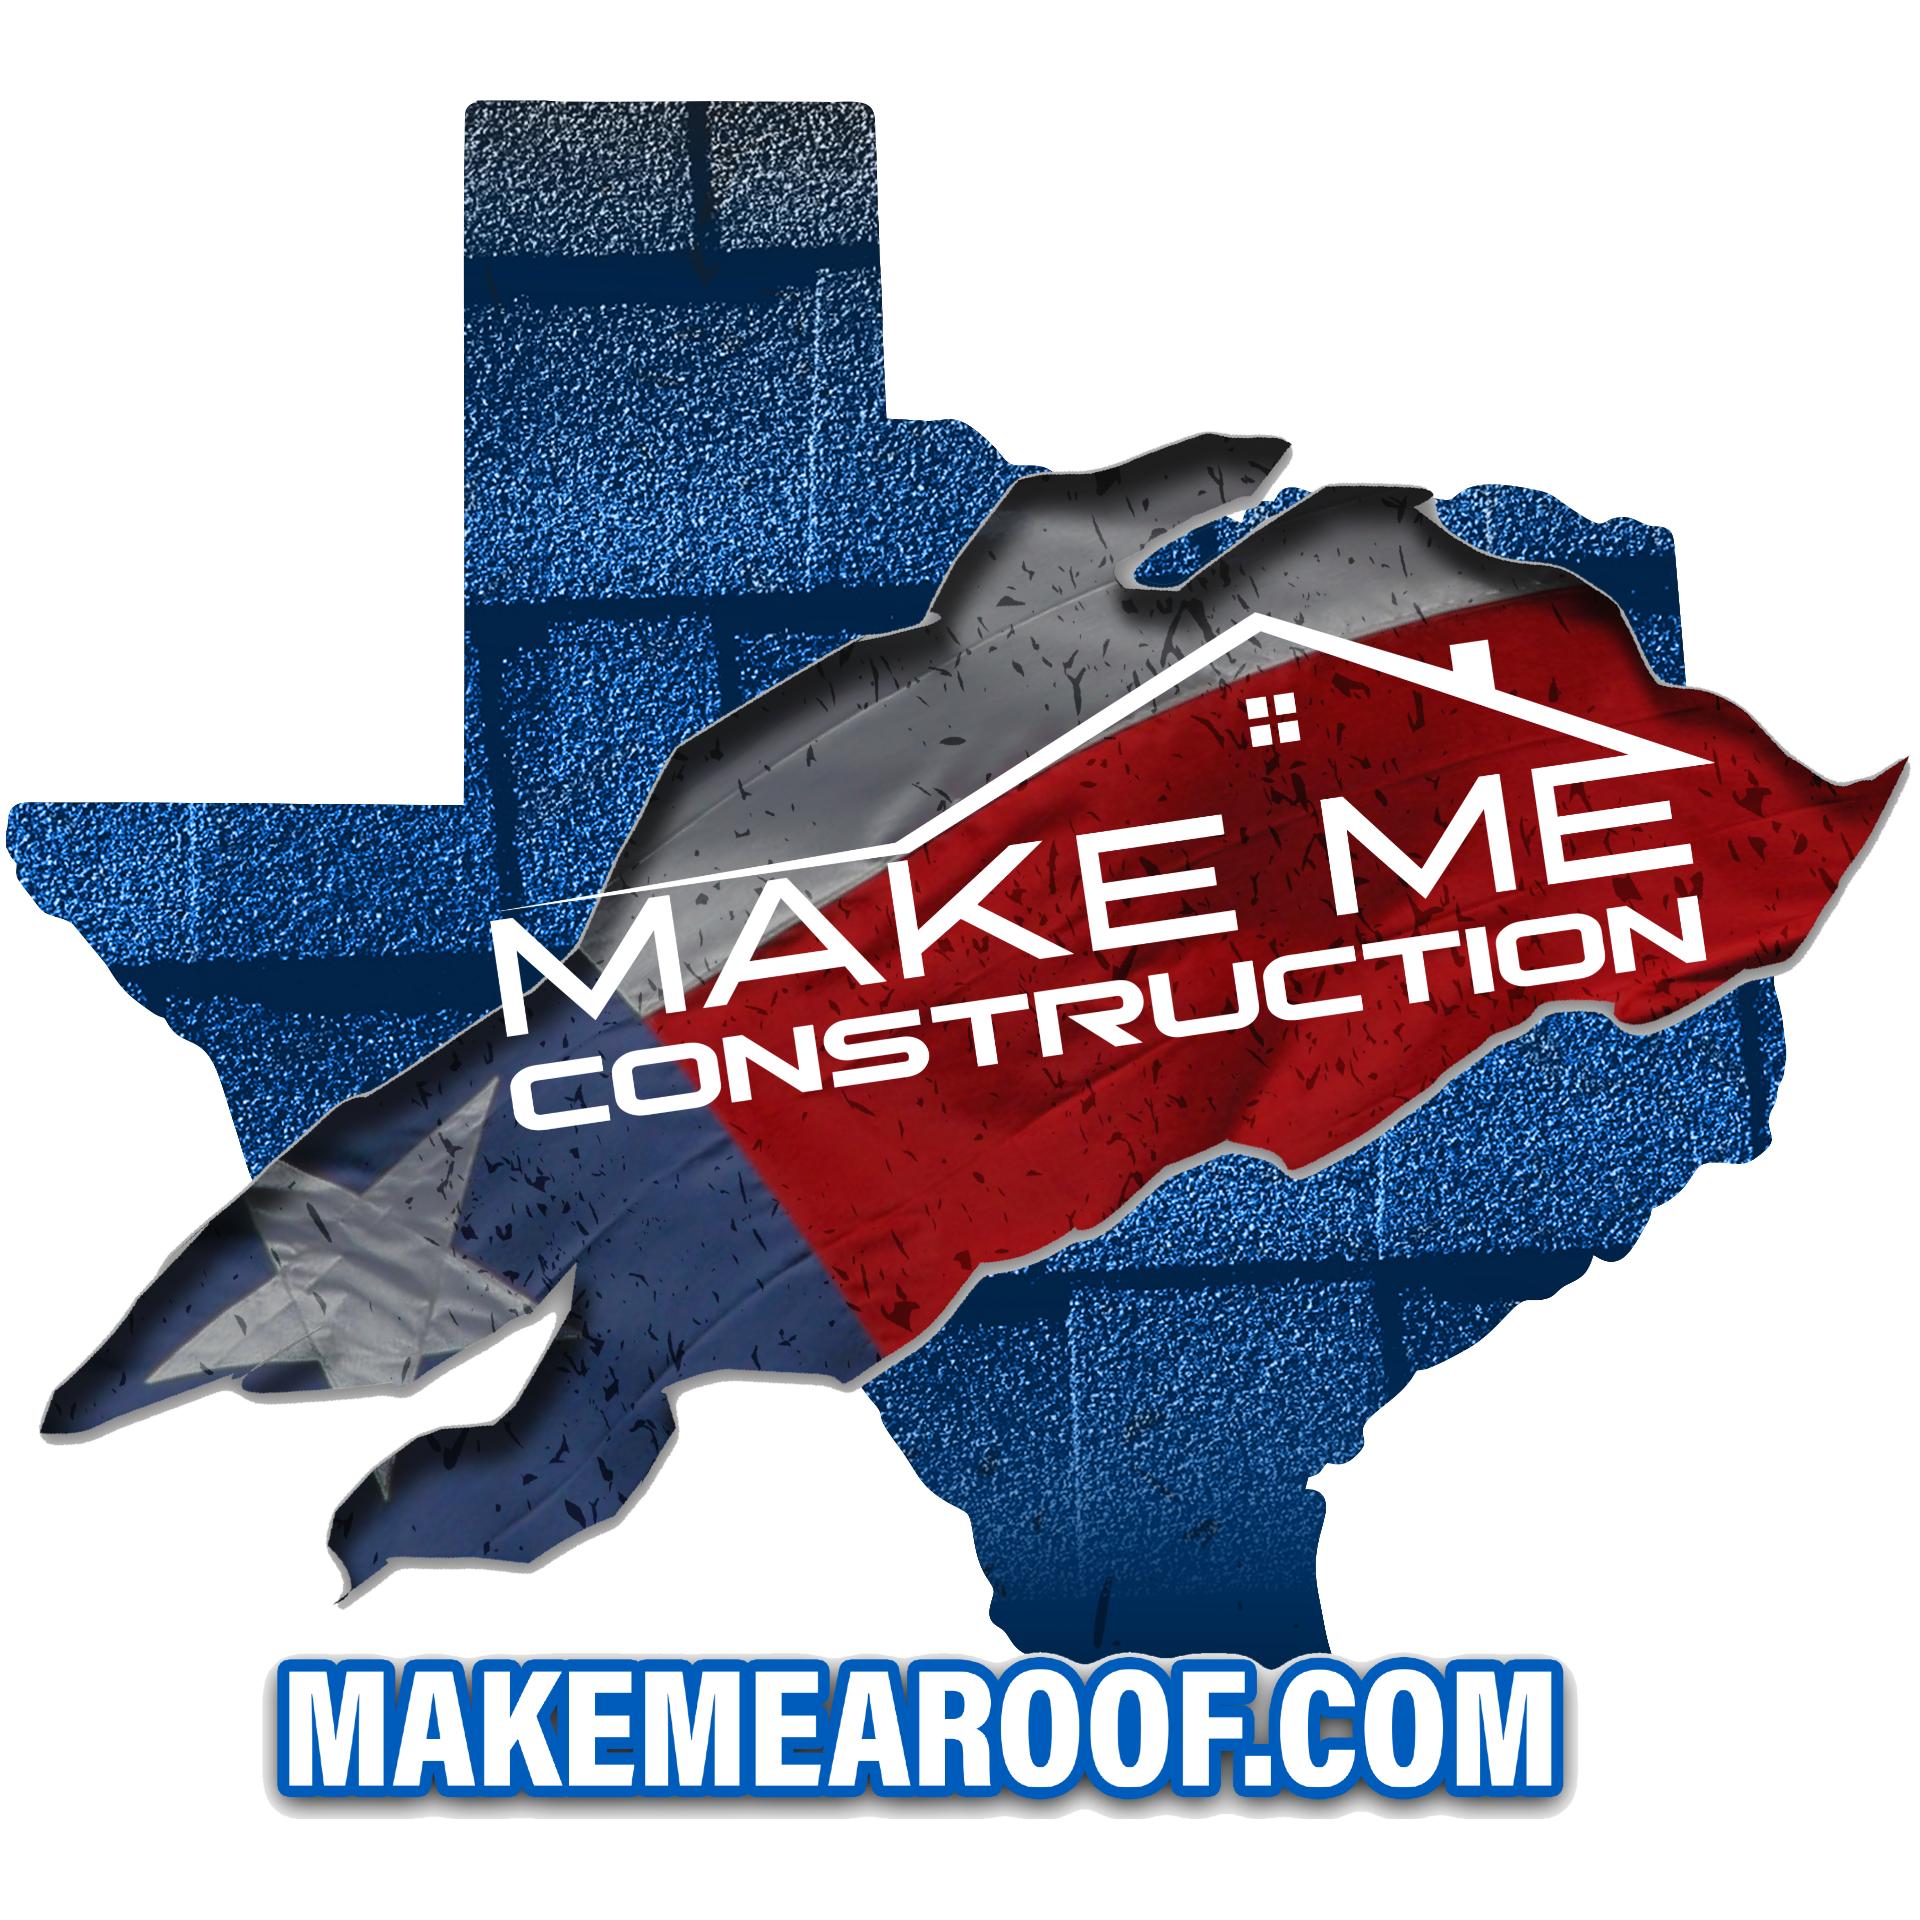 Make Me Construction